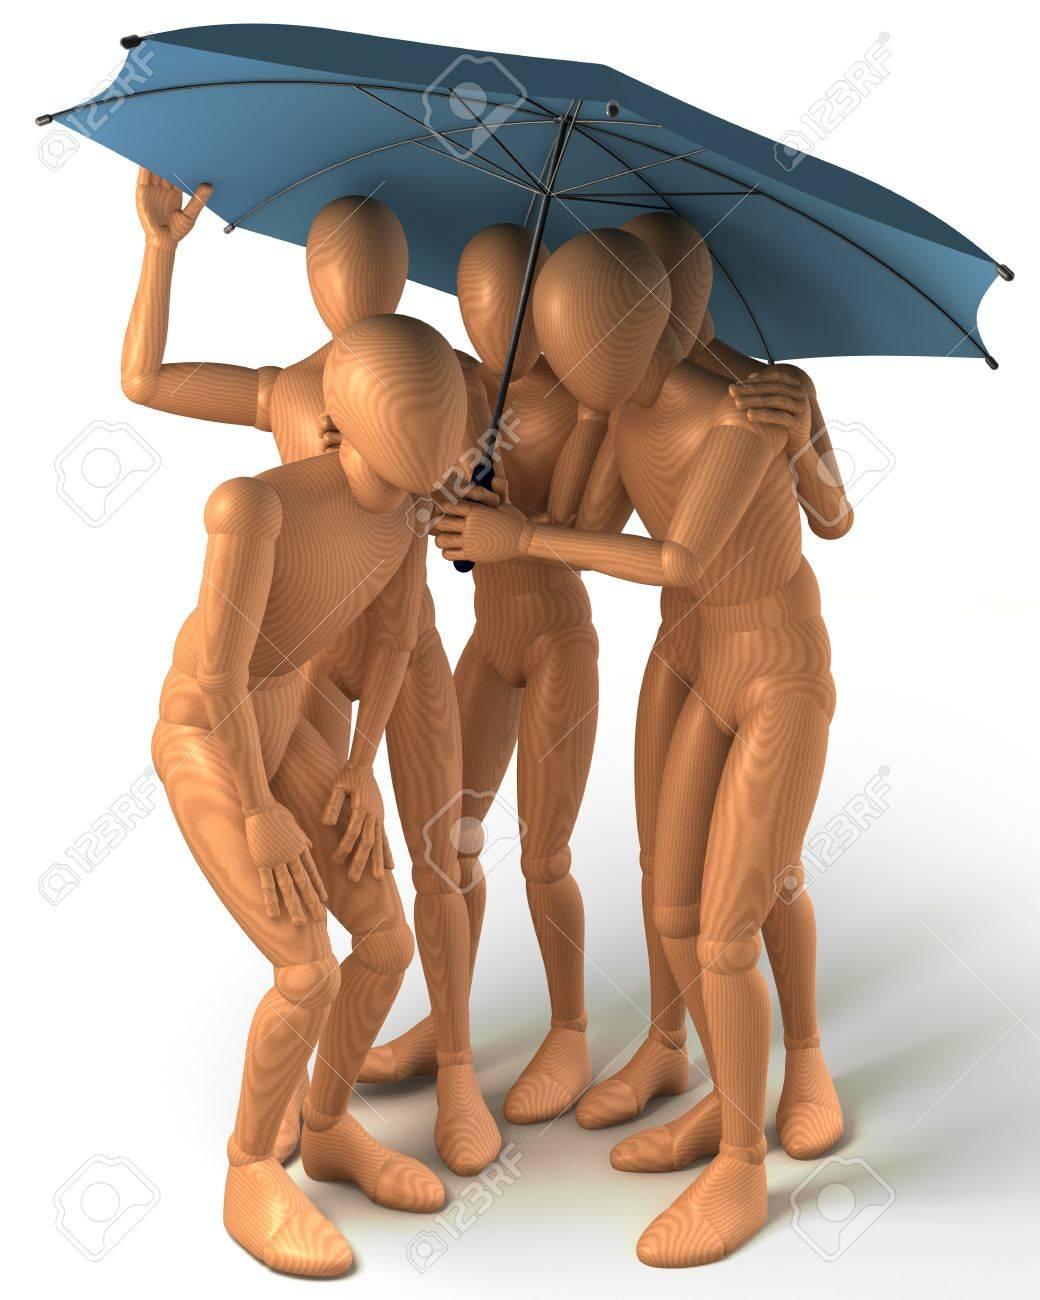 Four figures standing under umbrella Stock Photo - 20867679